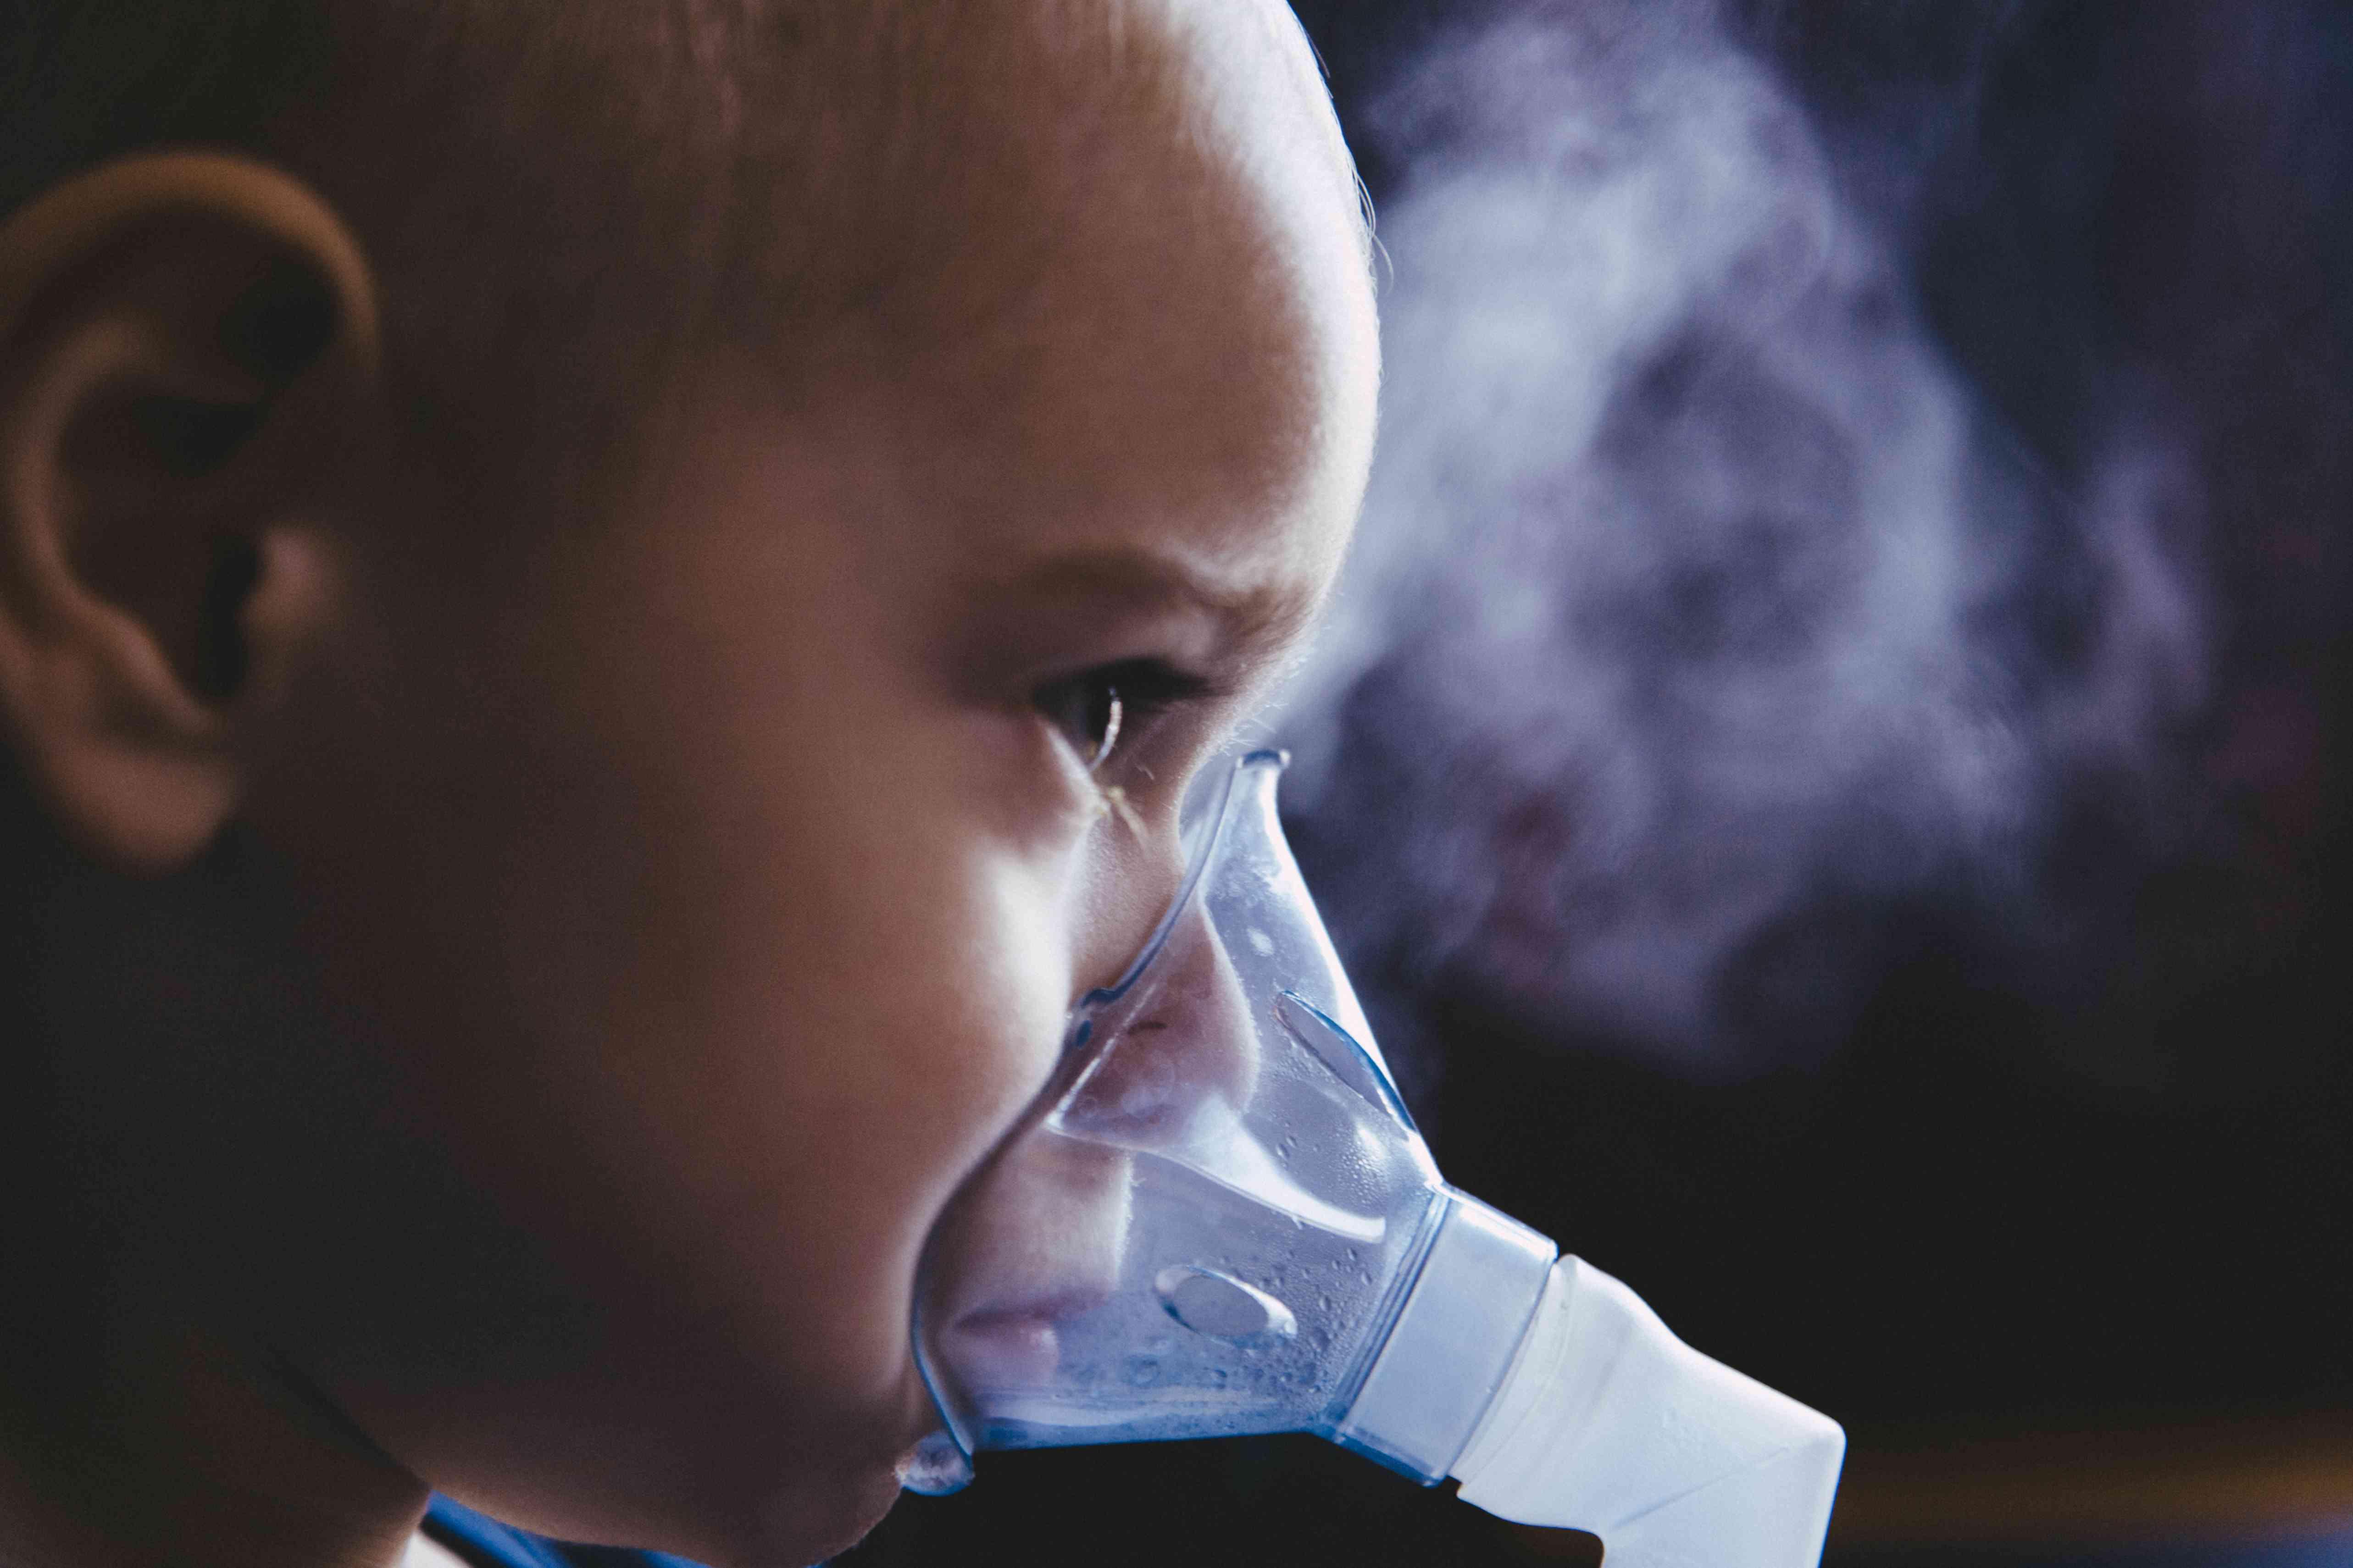 Boy with inhalation mask